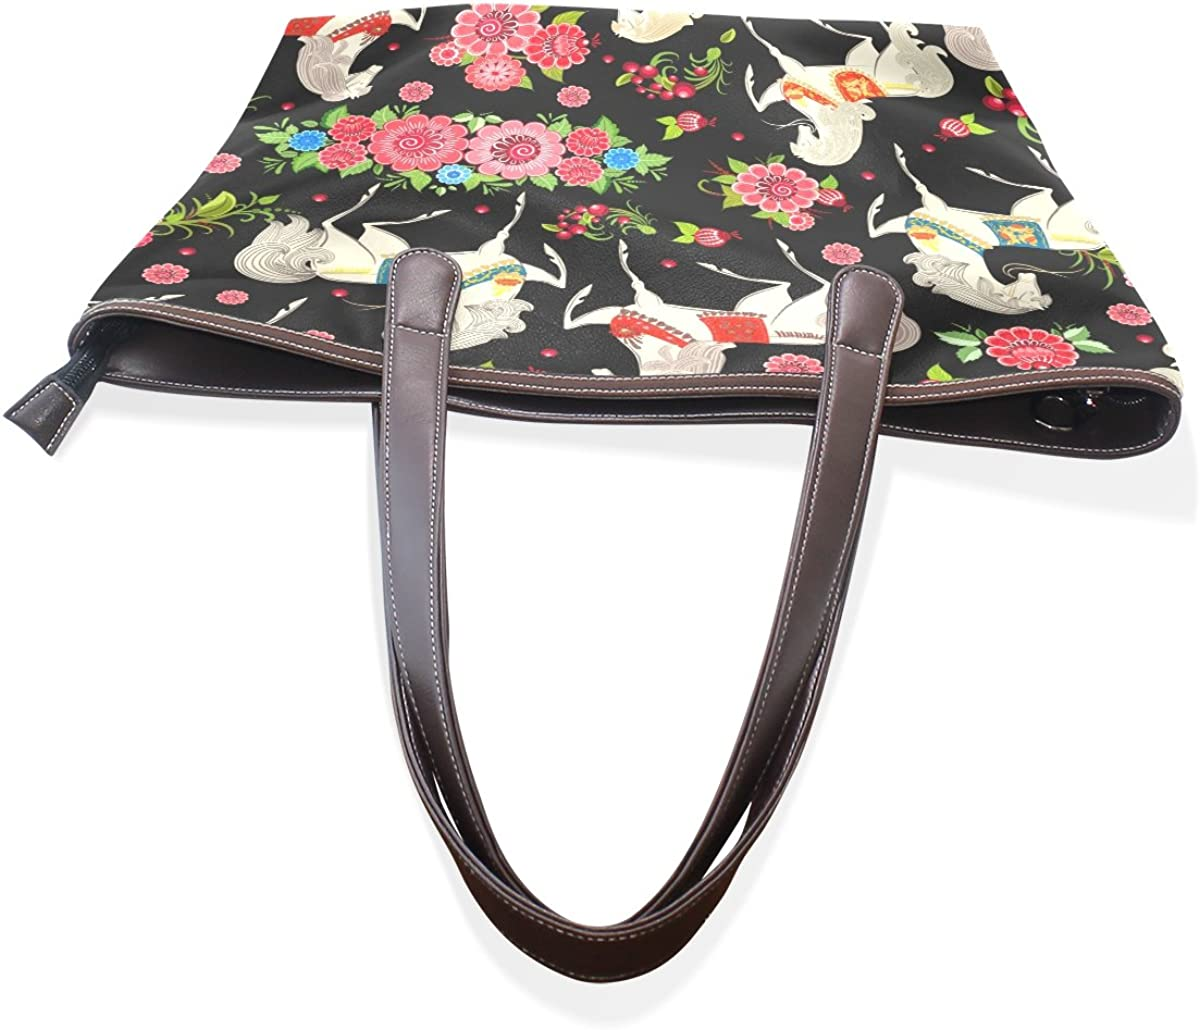 AURELIOR Retro Horses In Flowers Handbags For Women Girls PU Leather Shoulder Tote Bag